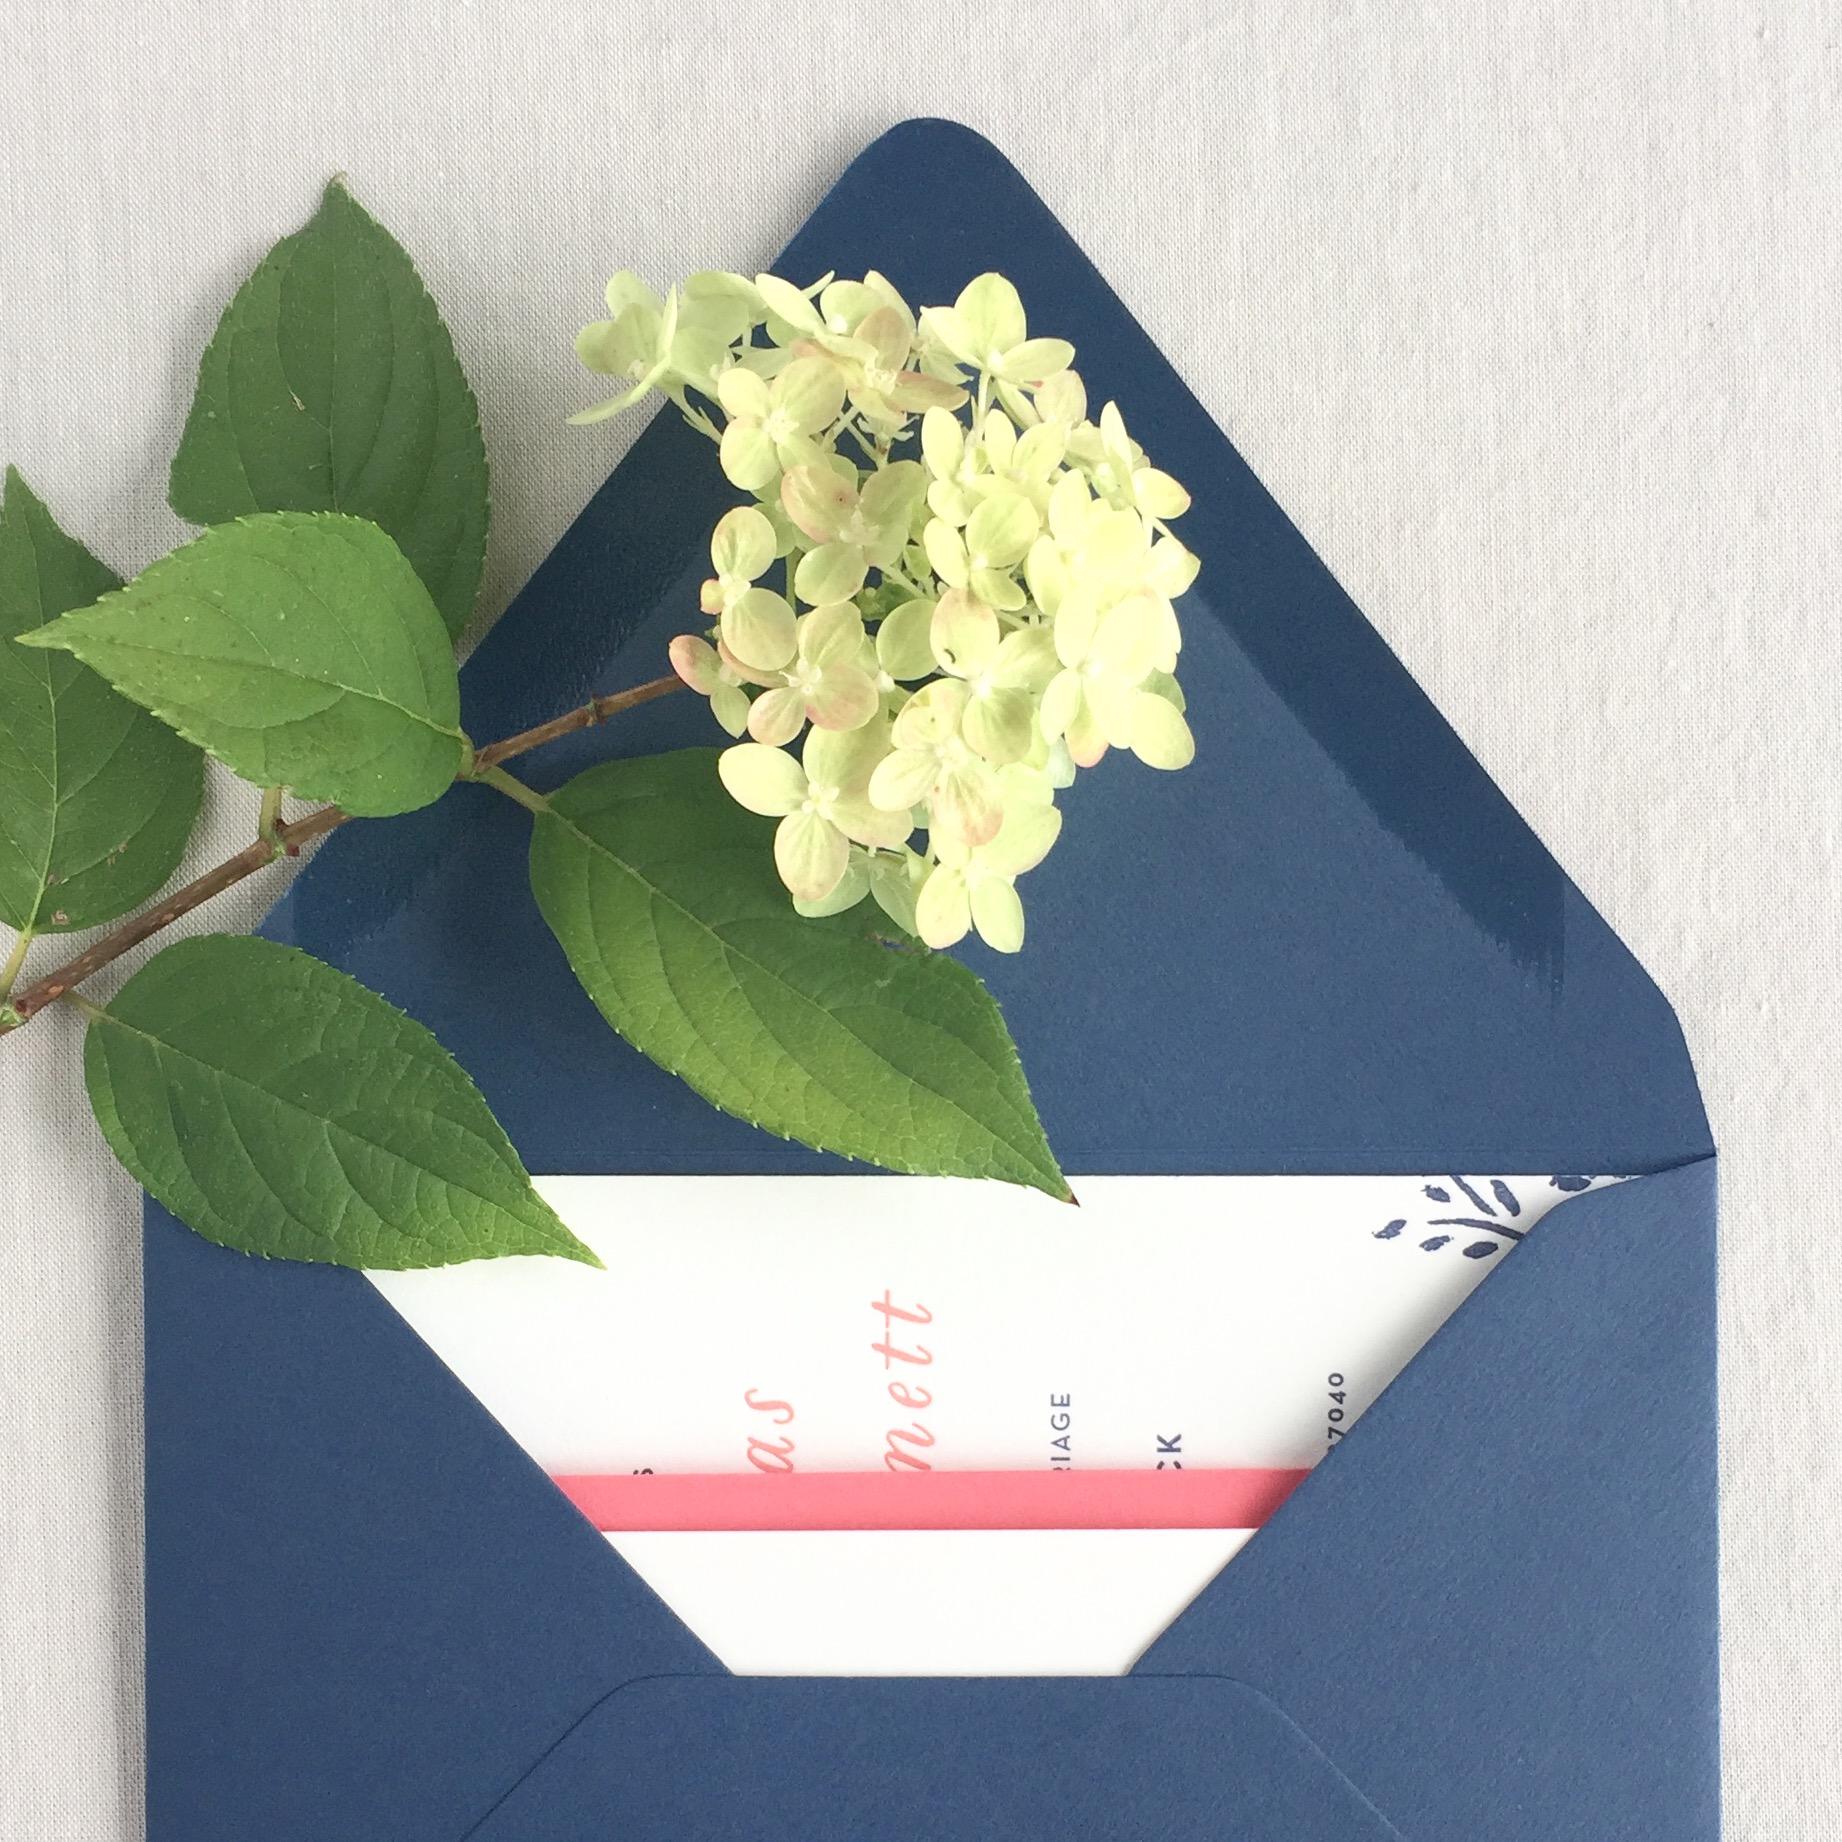 Maria_Bond_Design_North_Carolina_Wedding_Invite.jpg